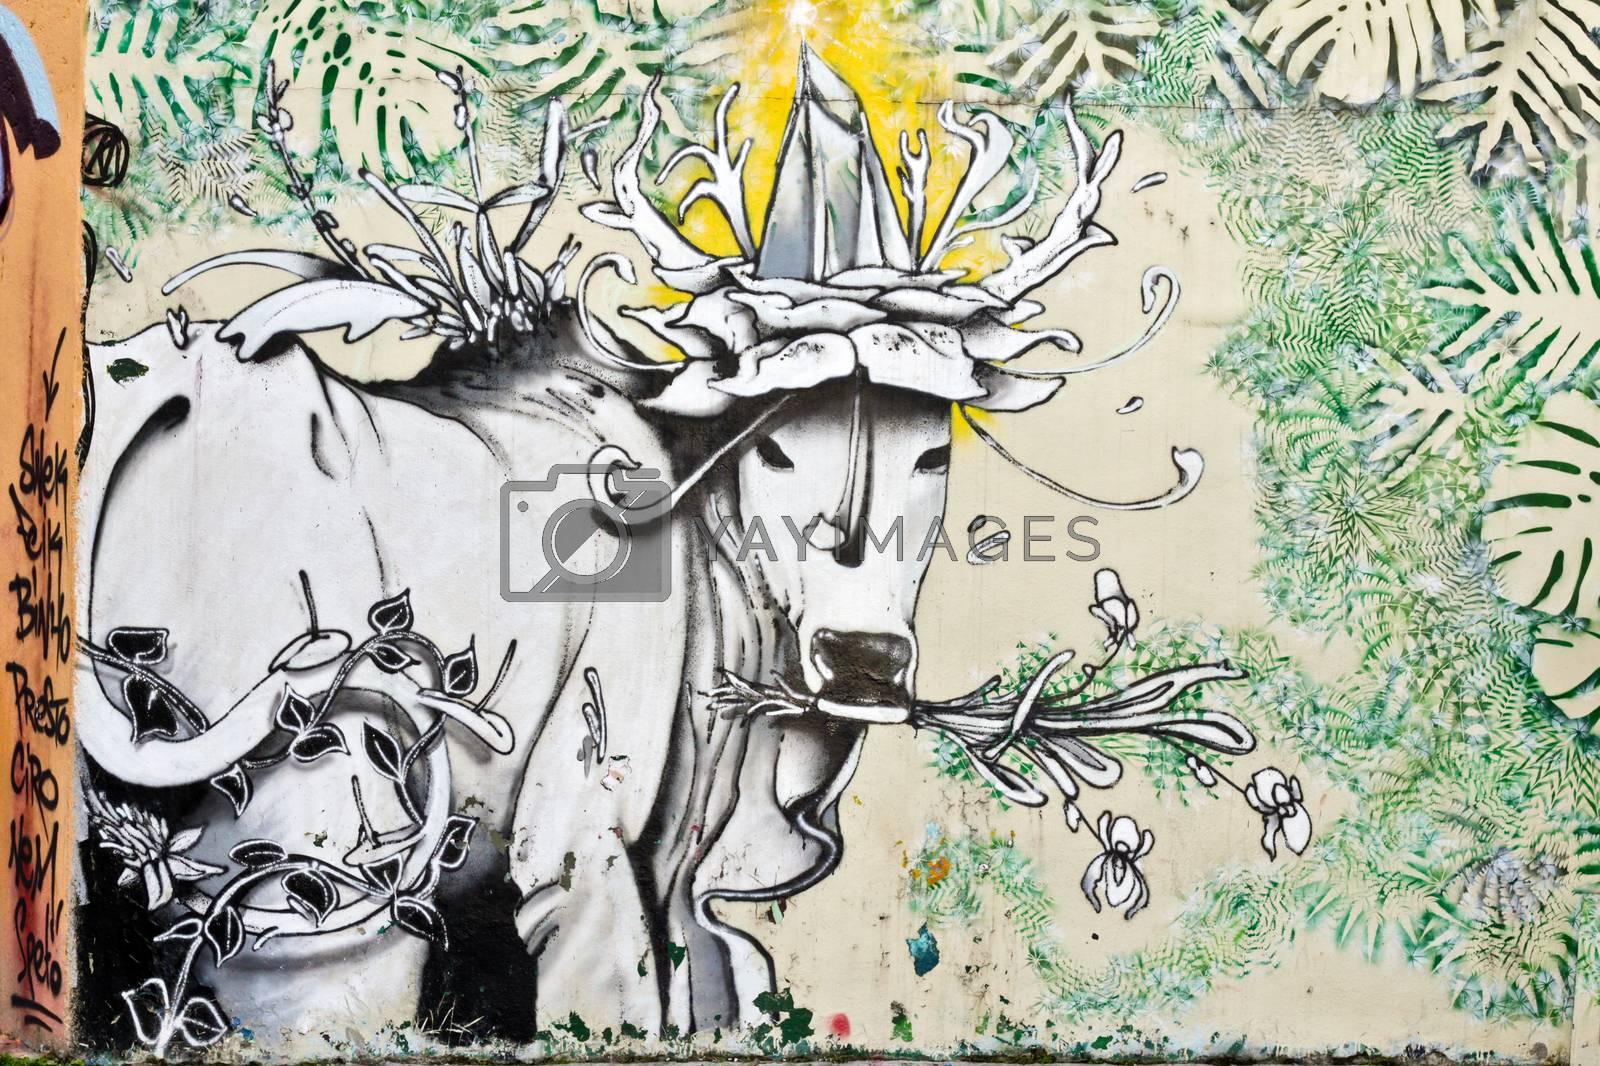 Sao Paulo, Brazil July 18, 2015: Graffiti detail of unidentified artist on the wall of the Batman alley in Sao Paulo Brazil.